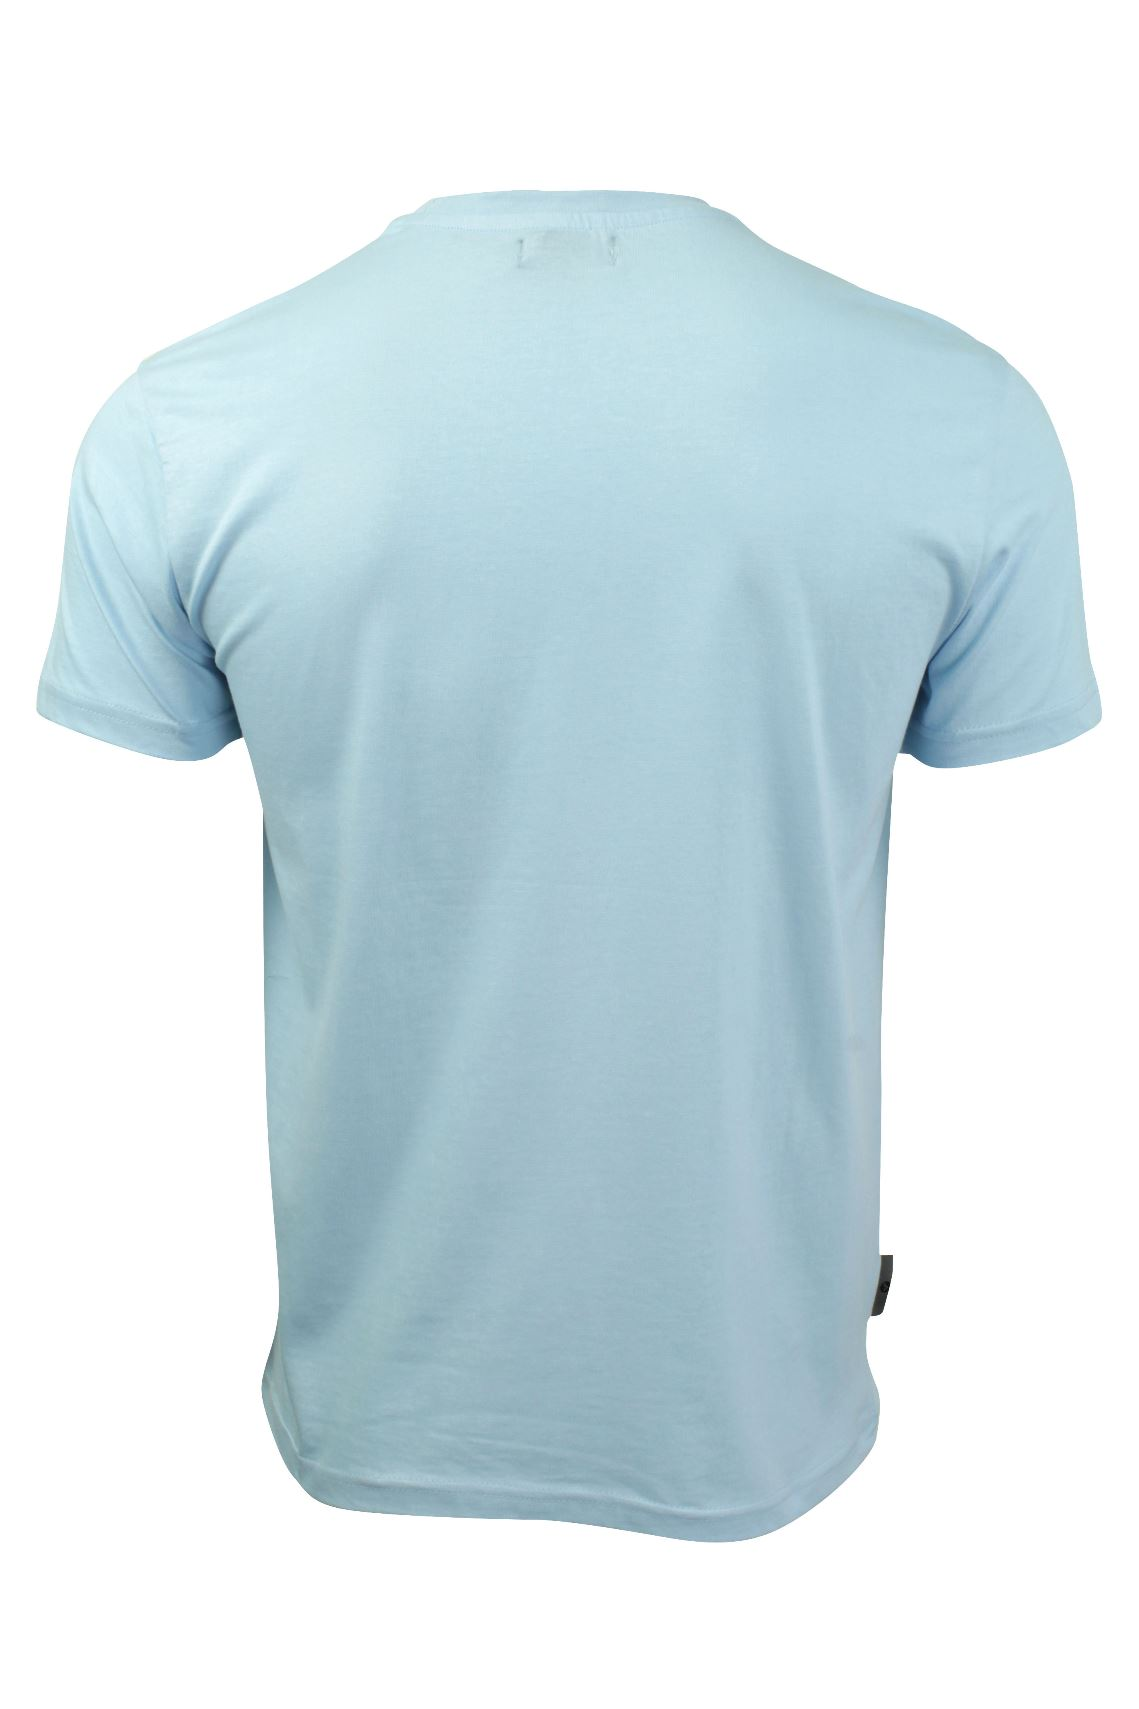 Hombre-Camiseta-De-Voi-Jeans-Manga-Corta miniatura 6